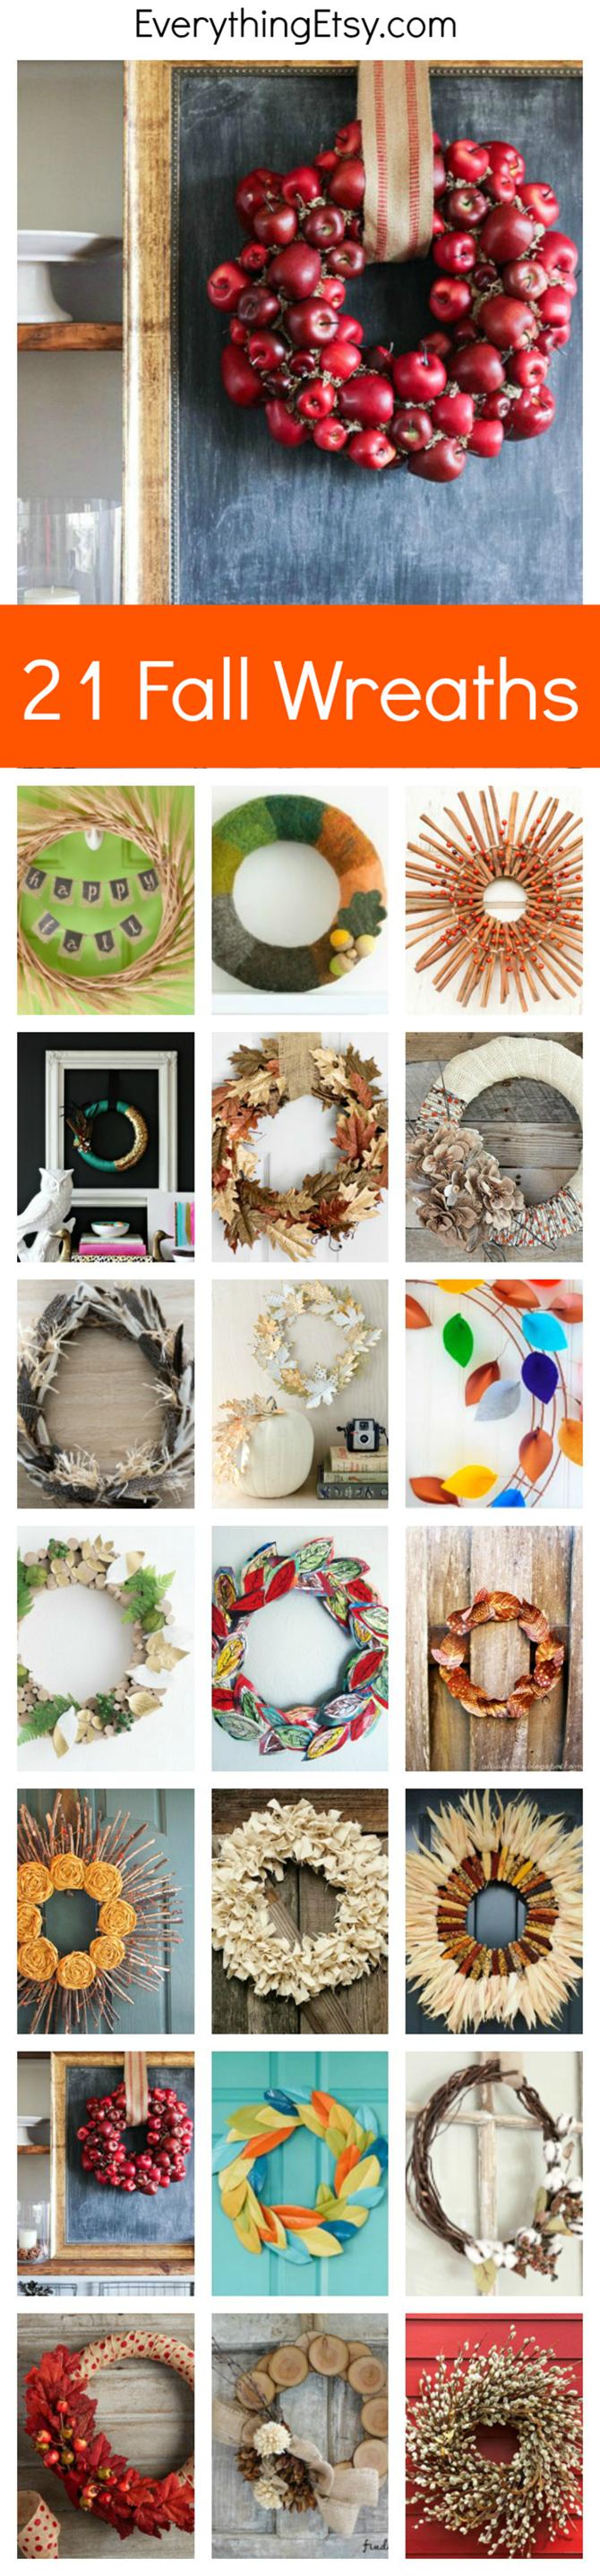 21 Fall Wreath Ideas and Tutorials on EverythingEtsy